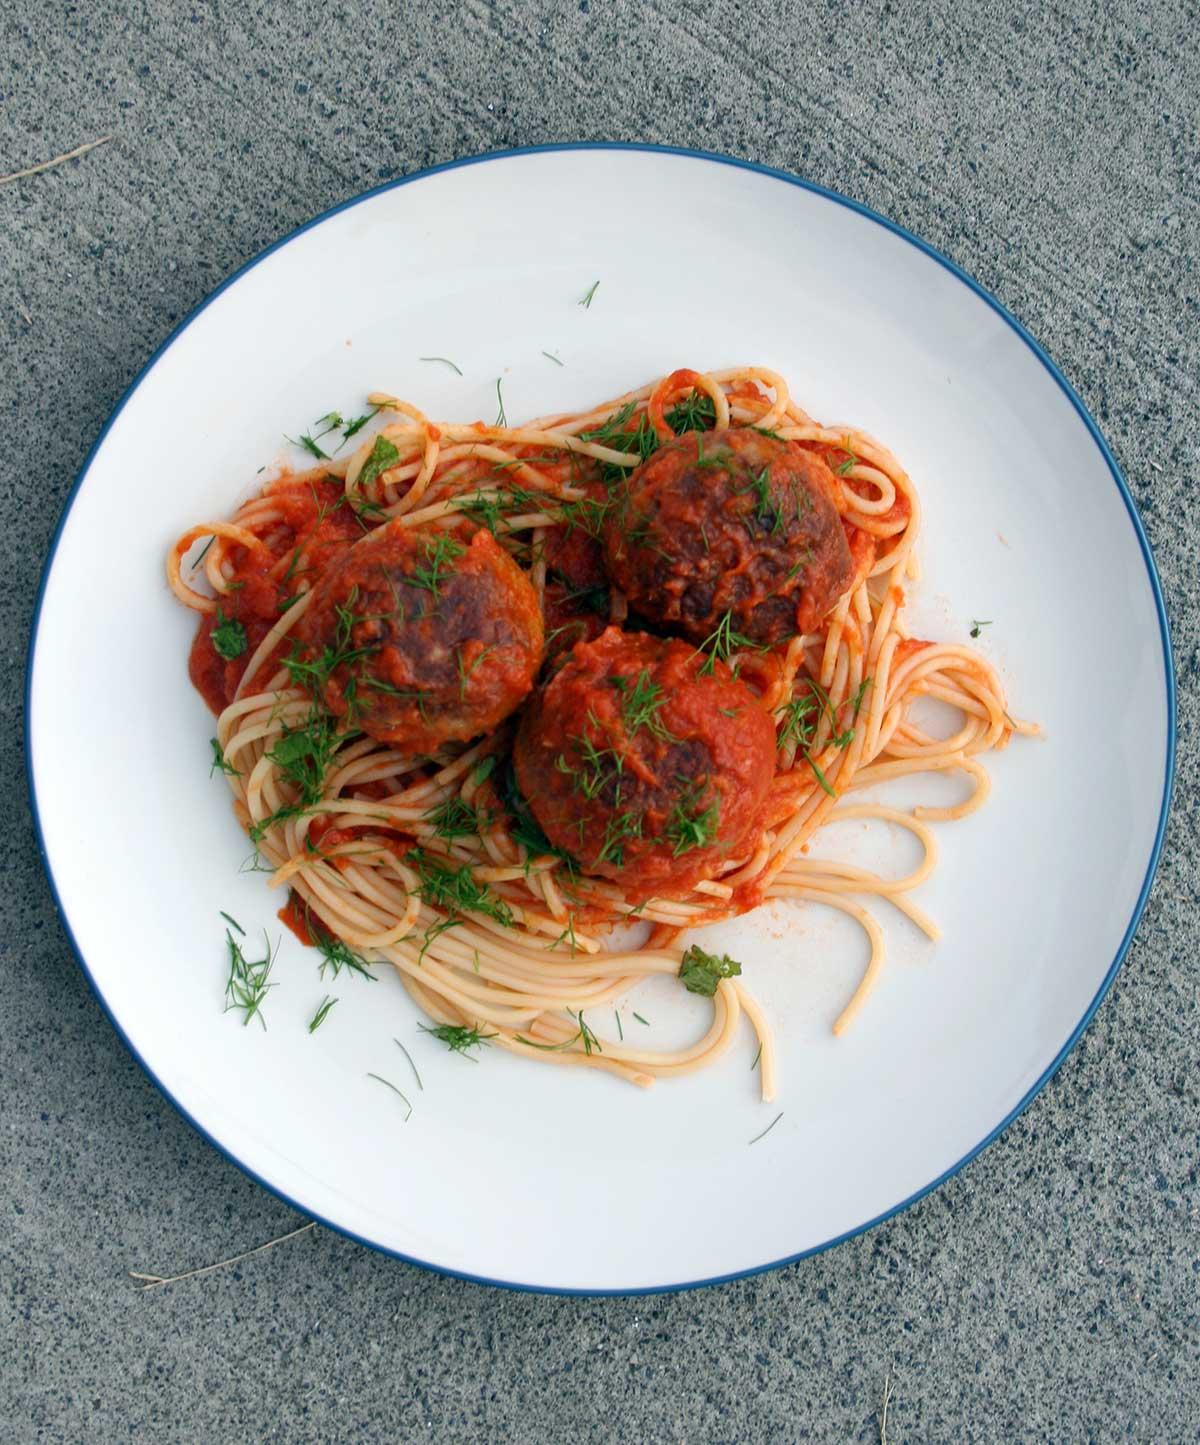 Sicilian tuna meatballs with spaghetti on a plate